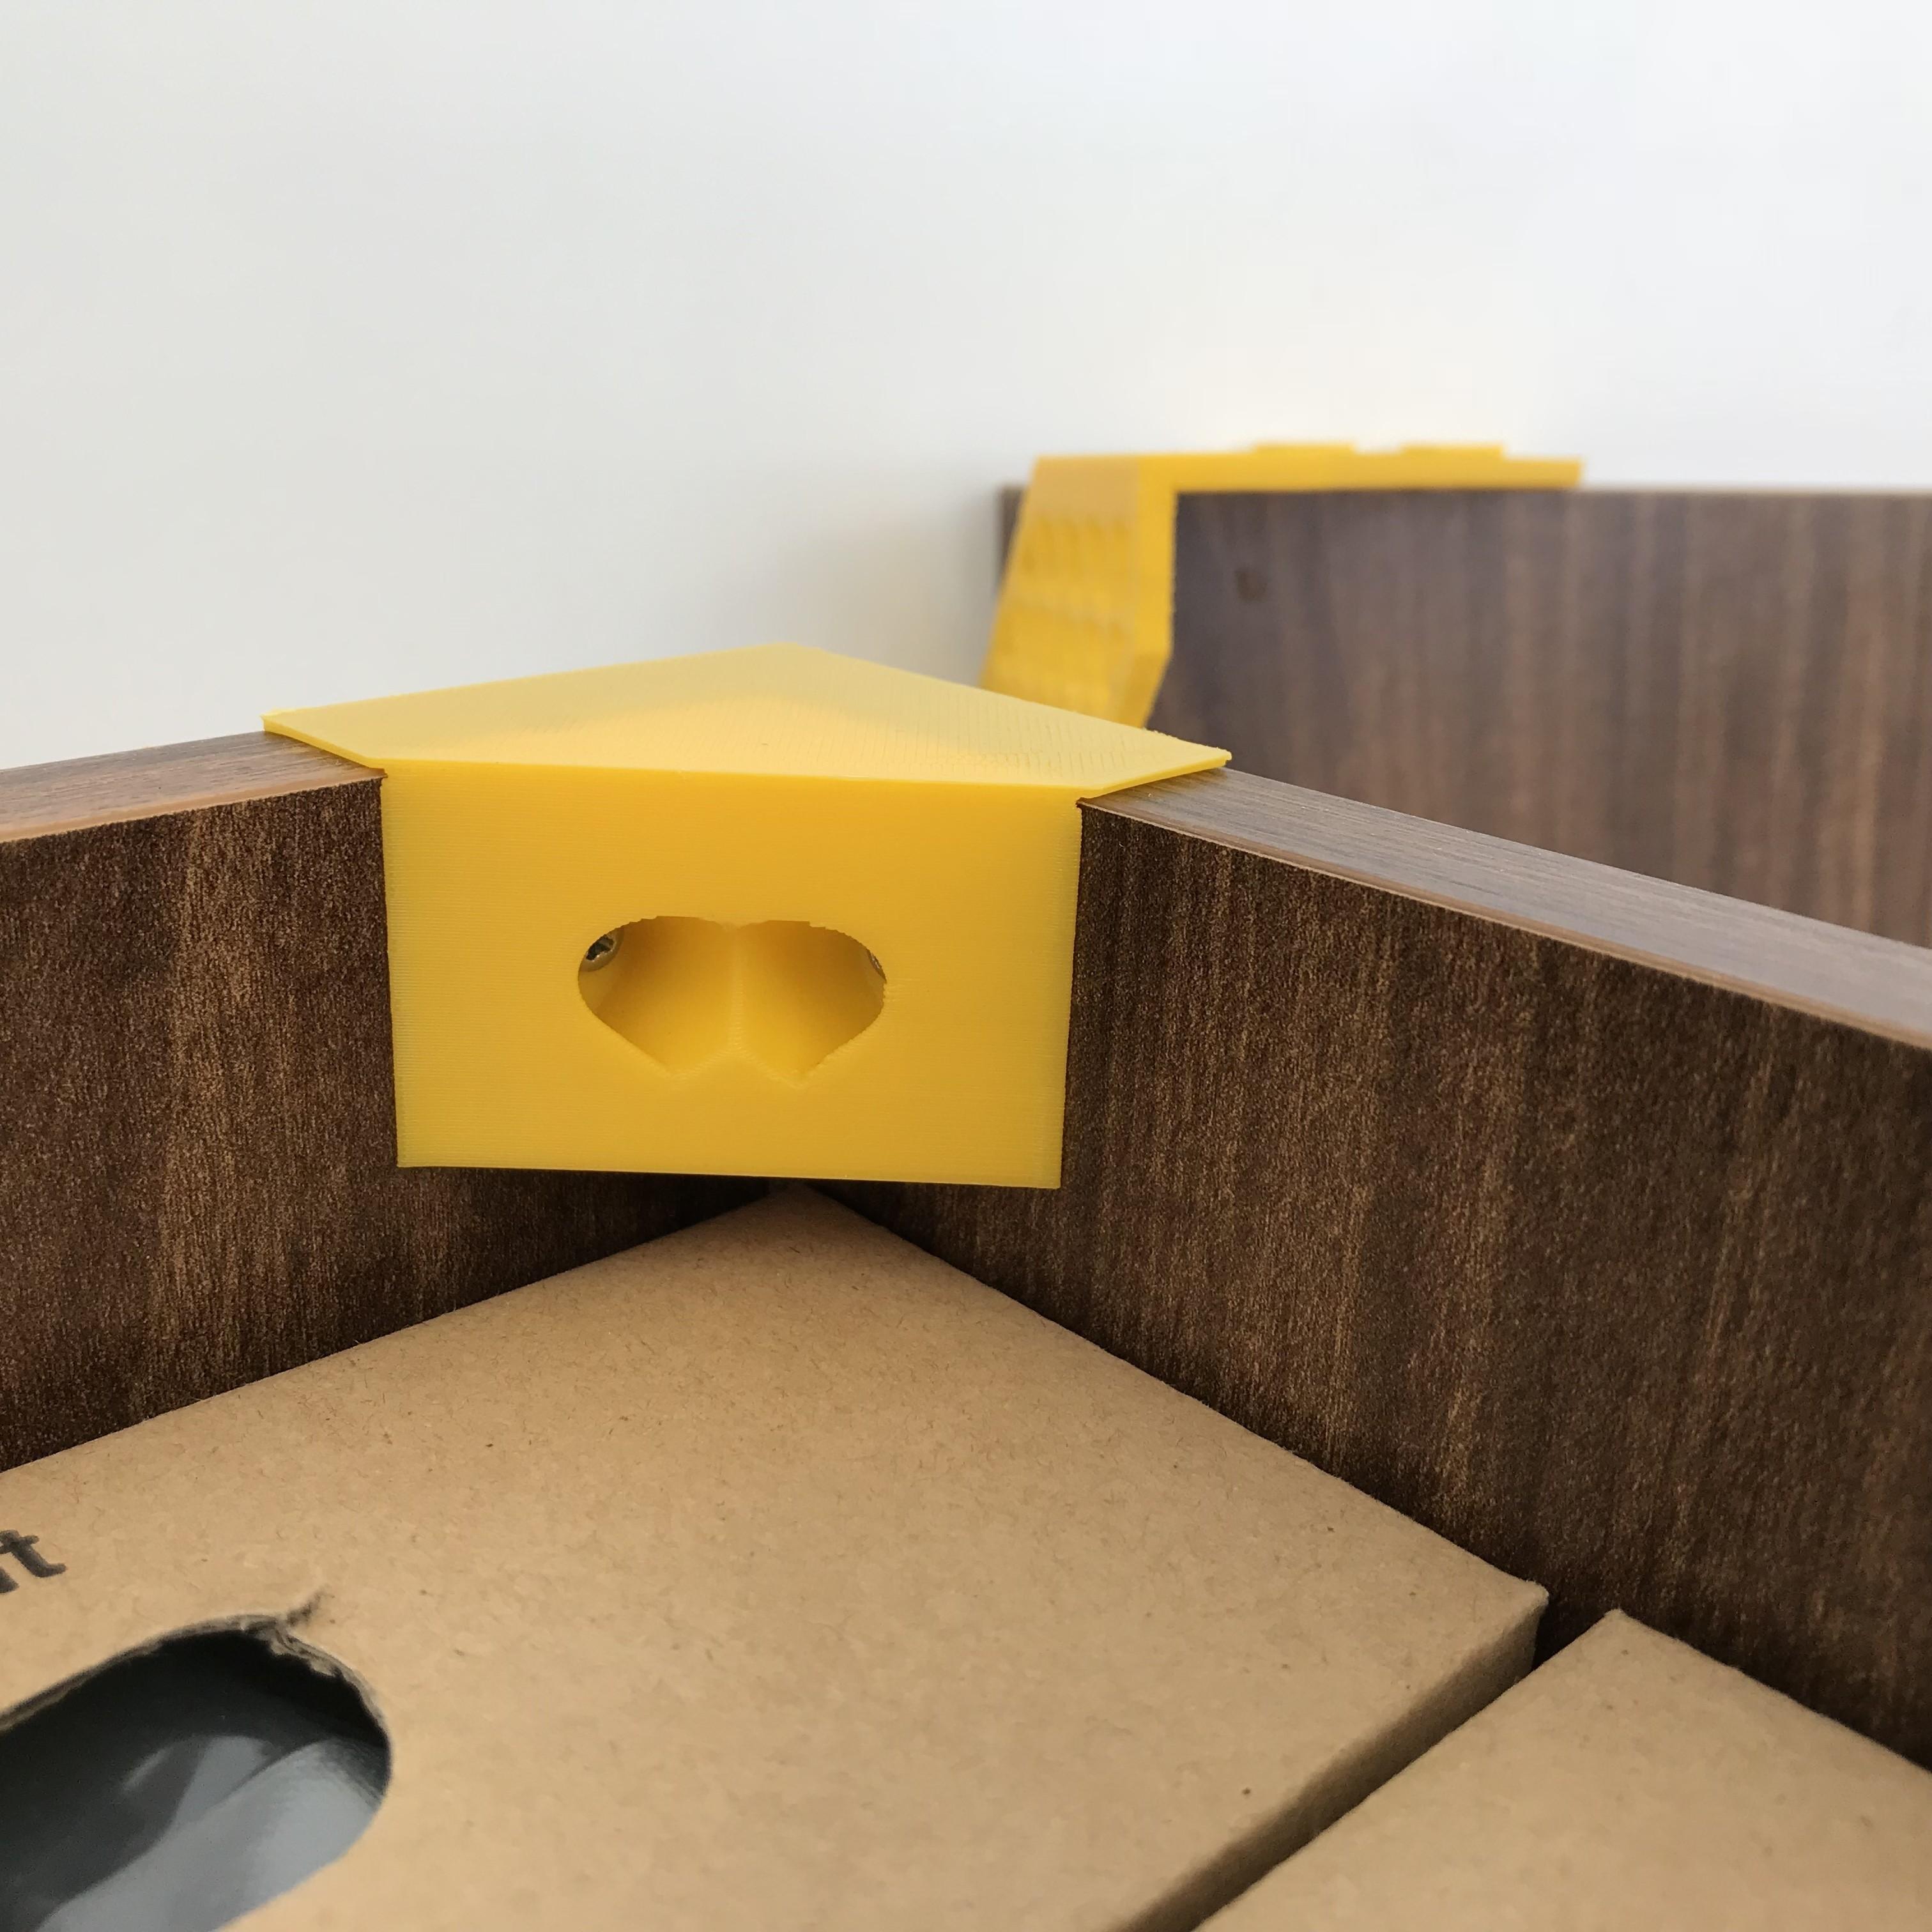 Mateus Machado_Cantoneira Trama _Print Mobi_05.JPG Download free STL file Furniture Cantoneiras Trama Print Mobi • 3D printing template, mateusmachado